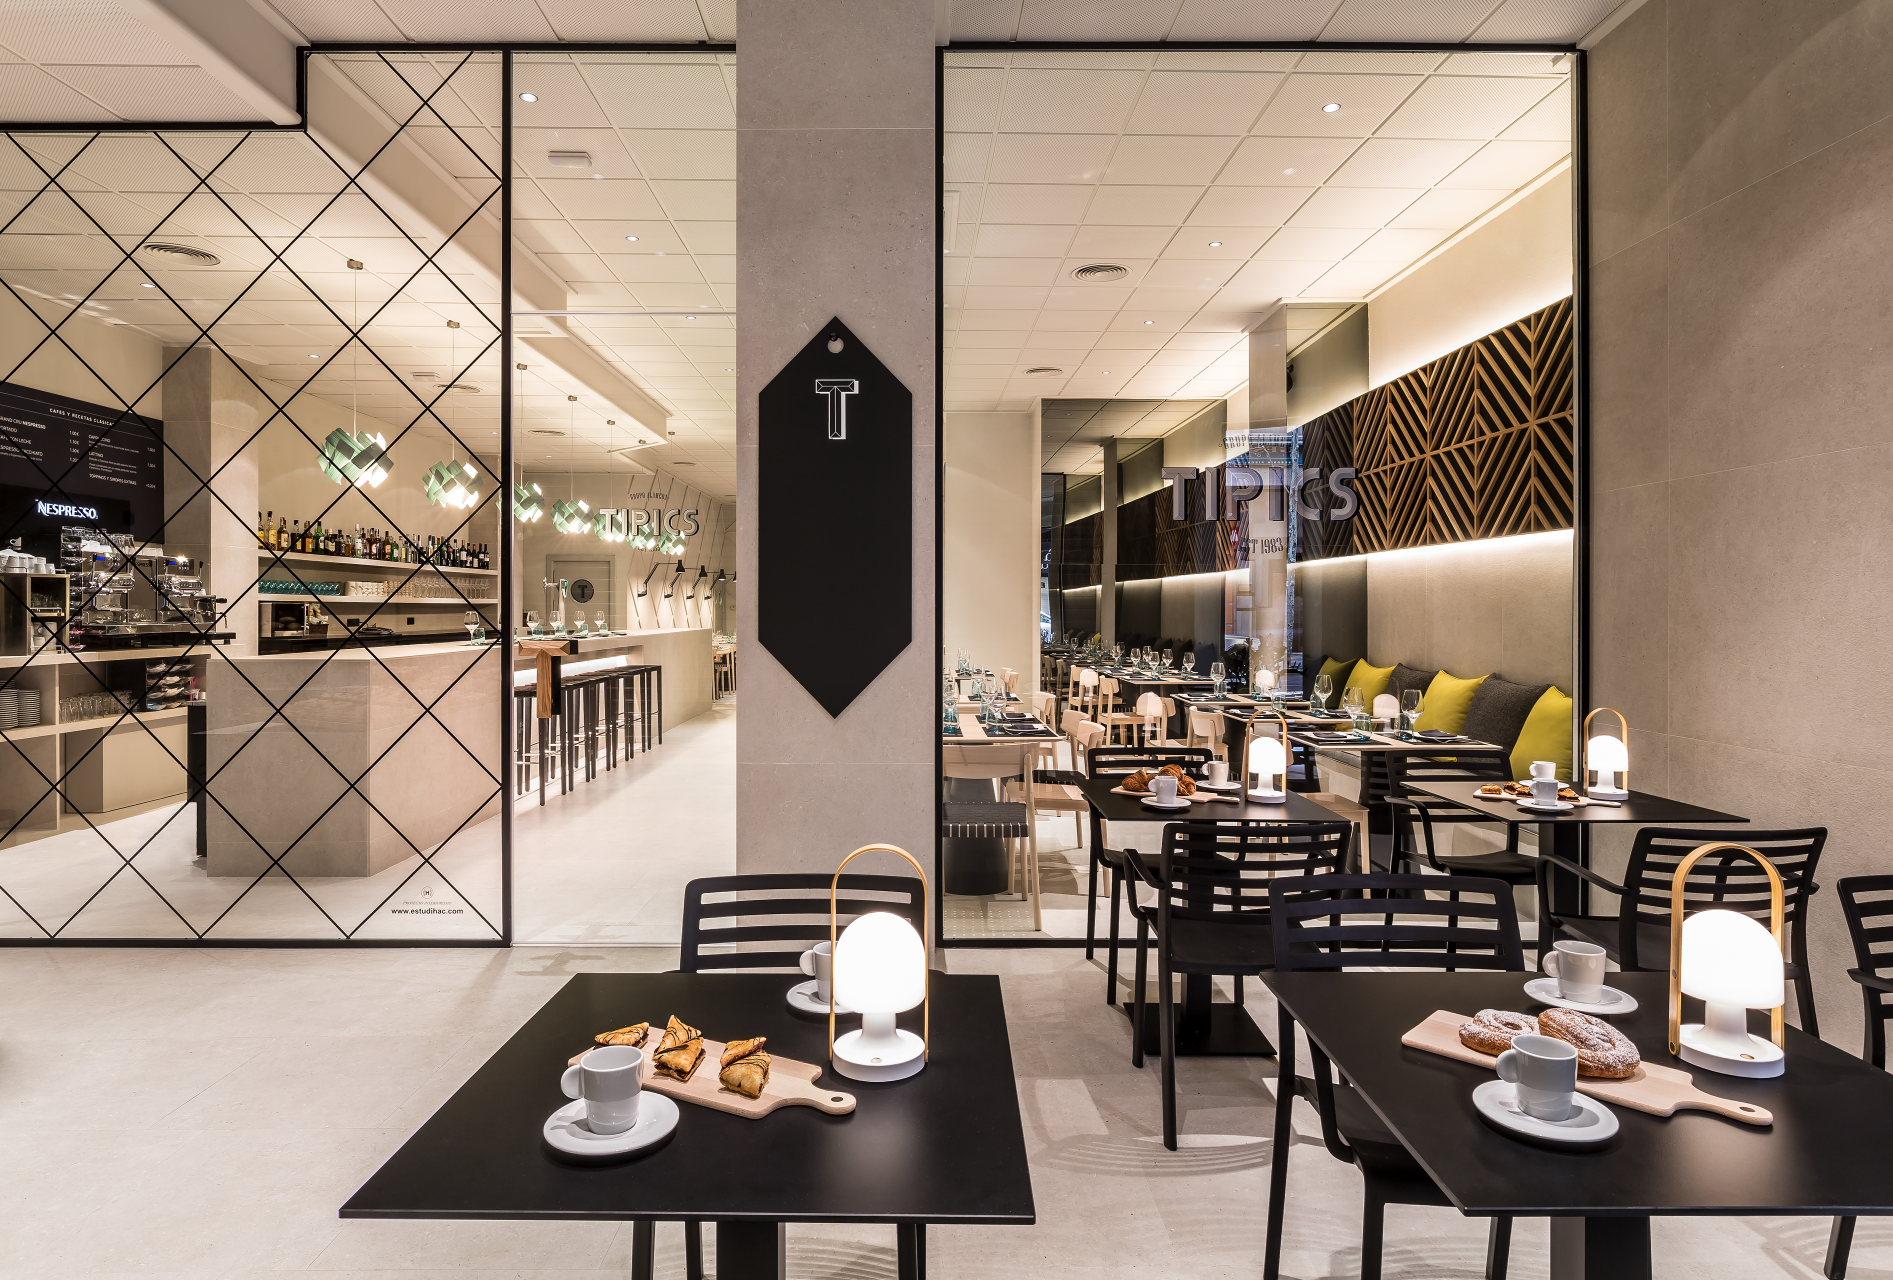 fotografia-arquitectura–interiorismo-valencia-german-cabo-estudihac-restaurante-tipics-xativa (6)